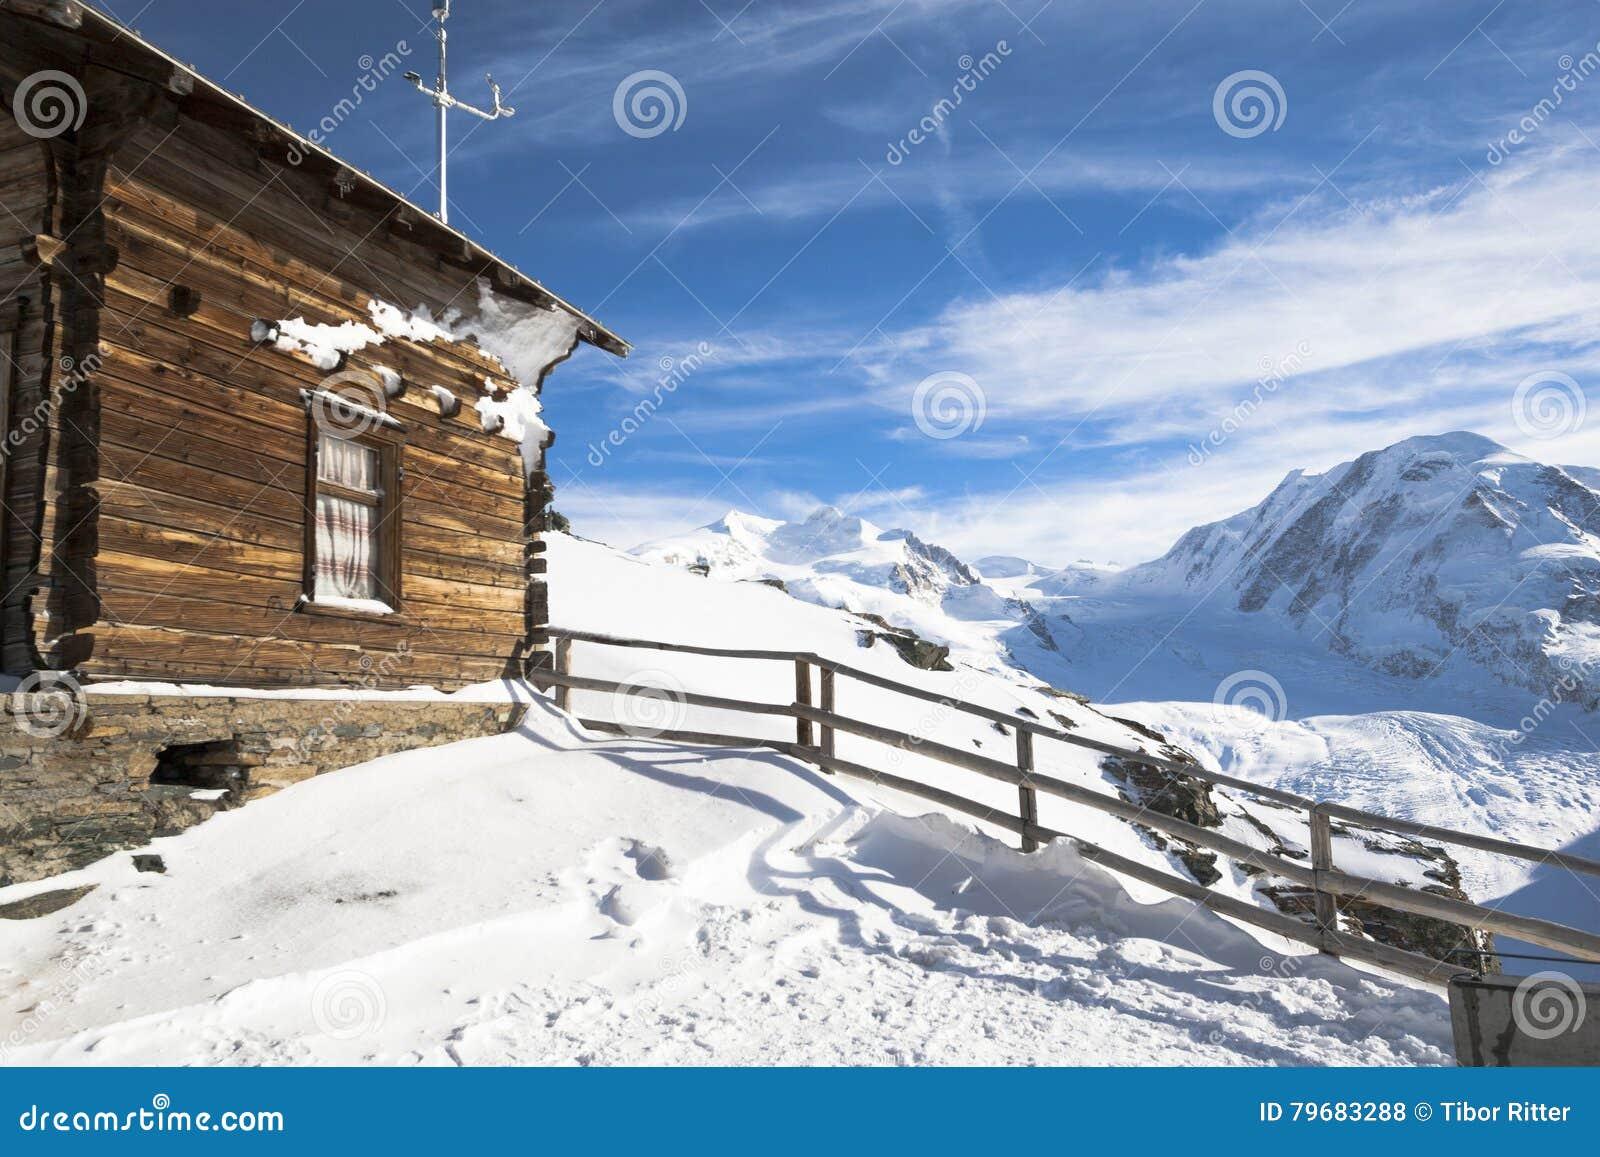 Hut on the Gornergrat